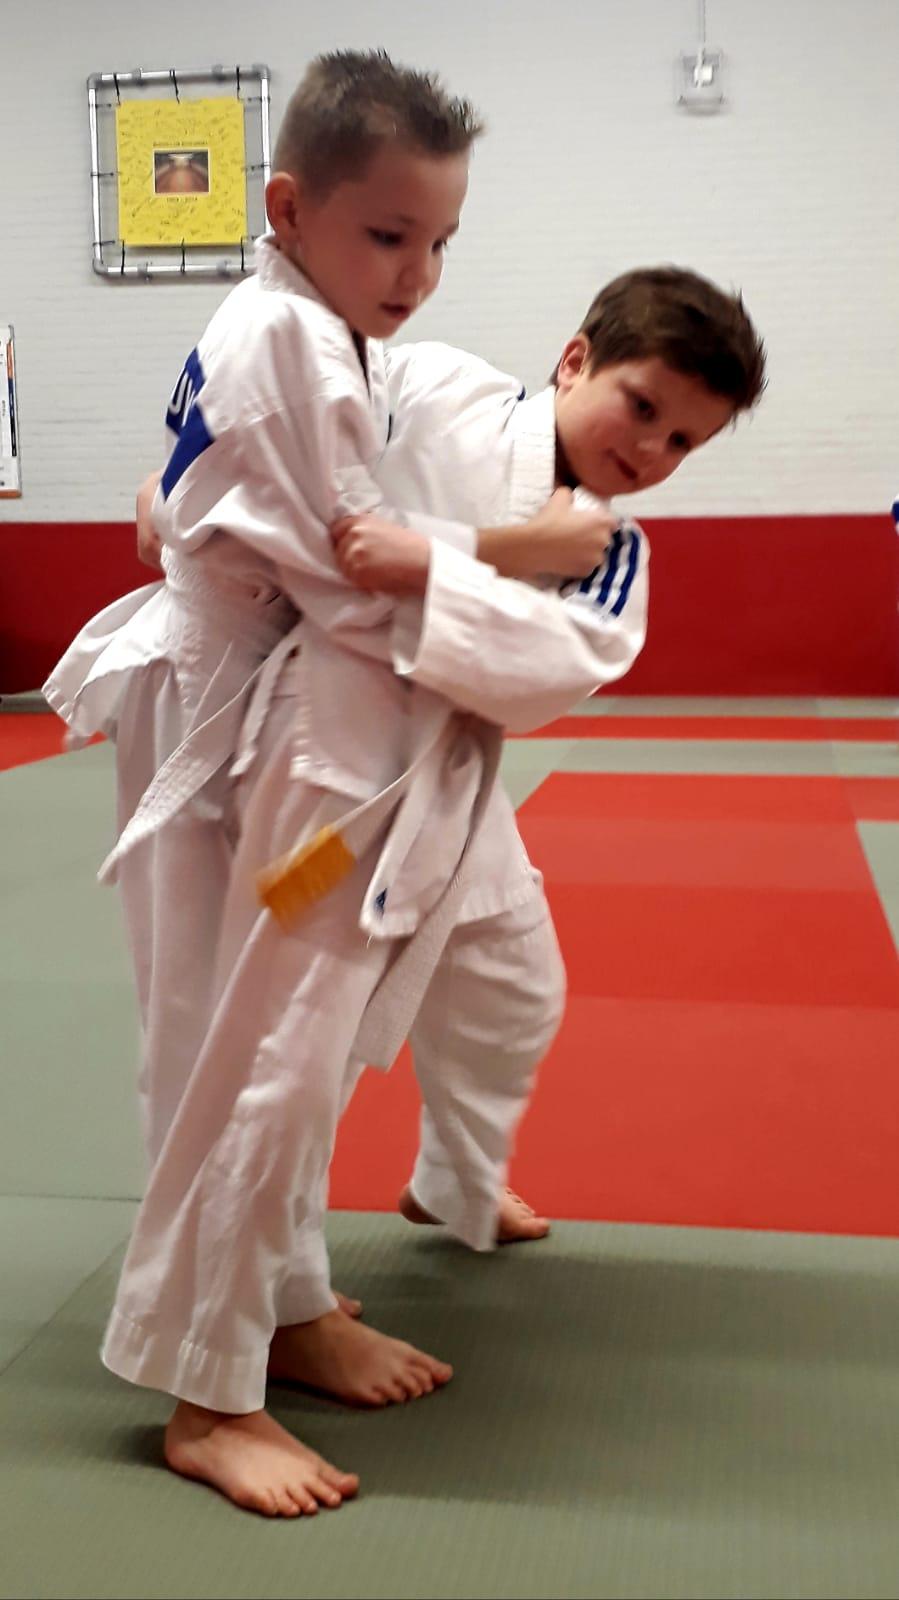 Judo examens groep 1 en 2